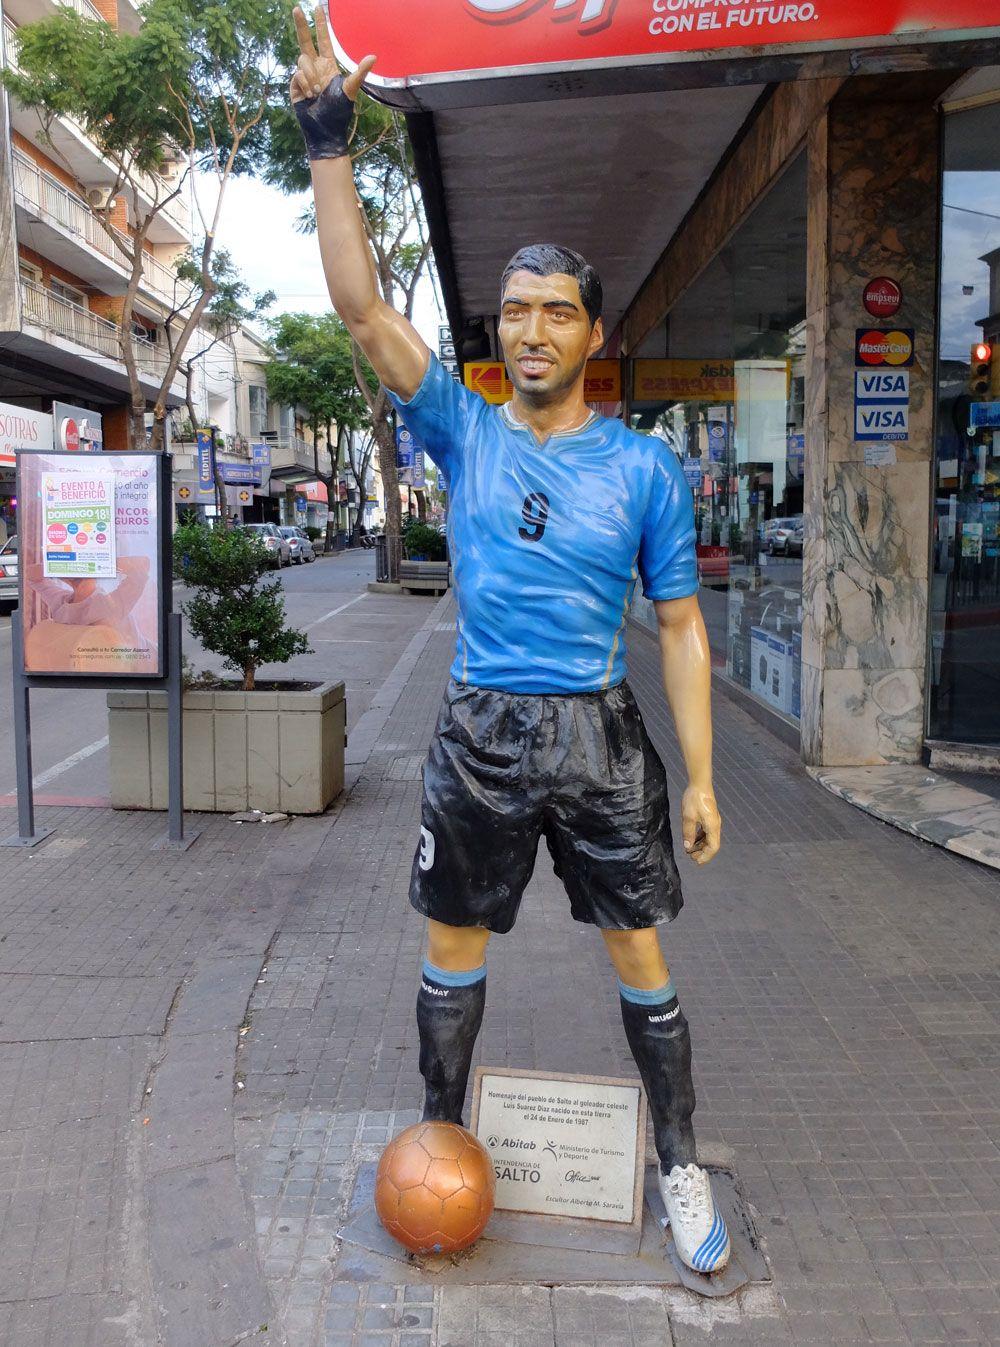 Luis Suarez's statue stands in his hometown.